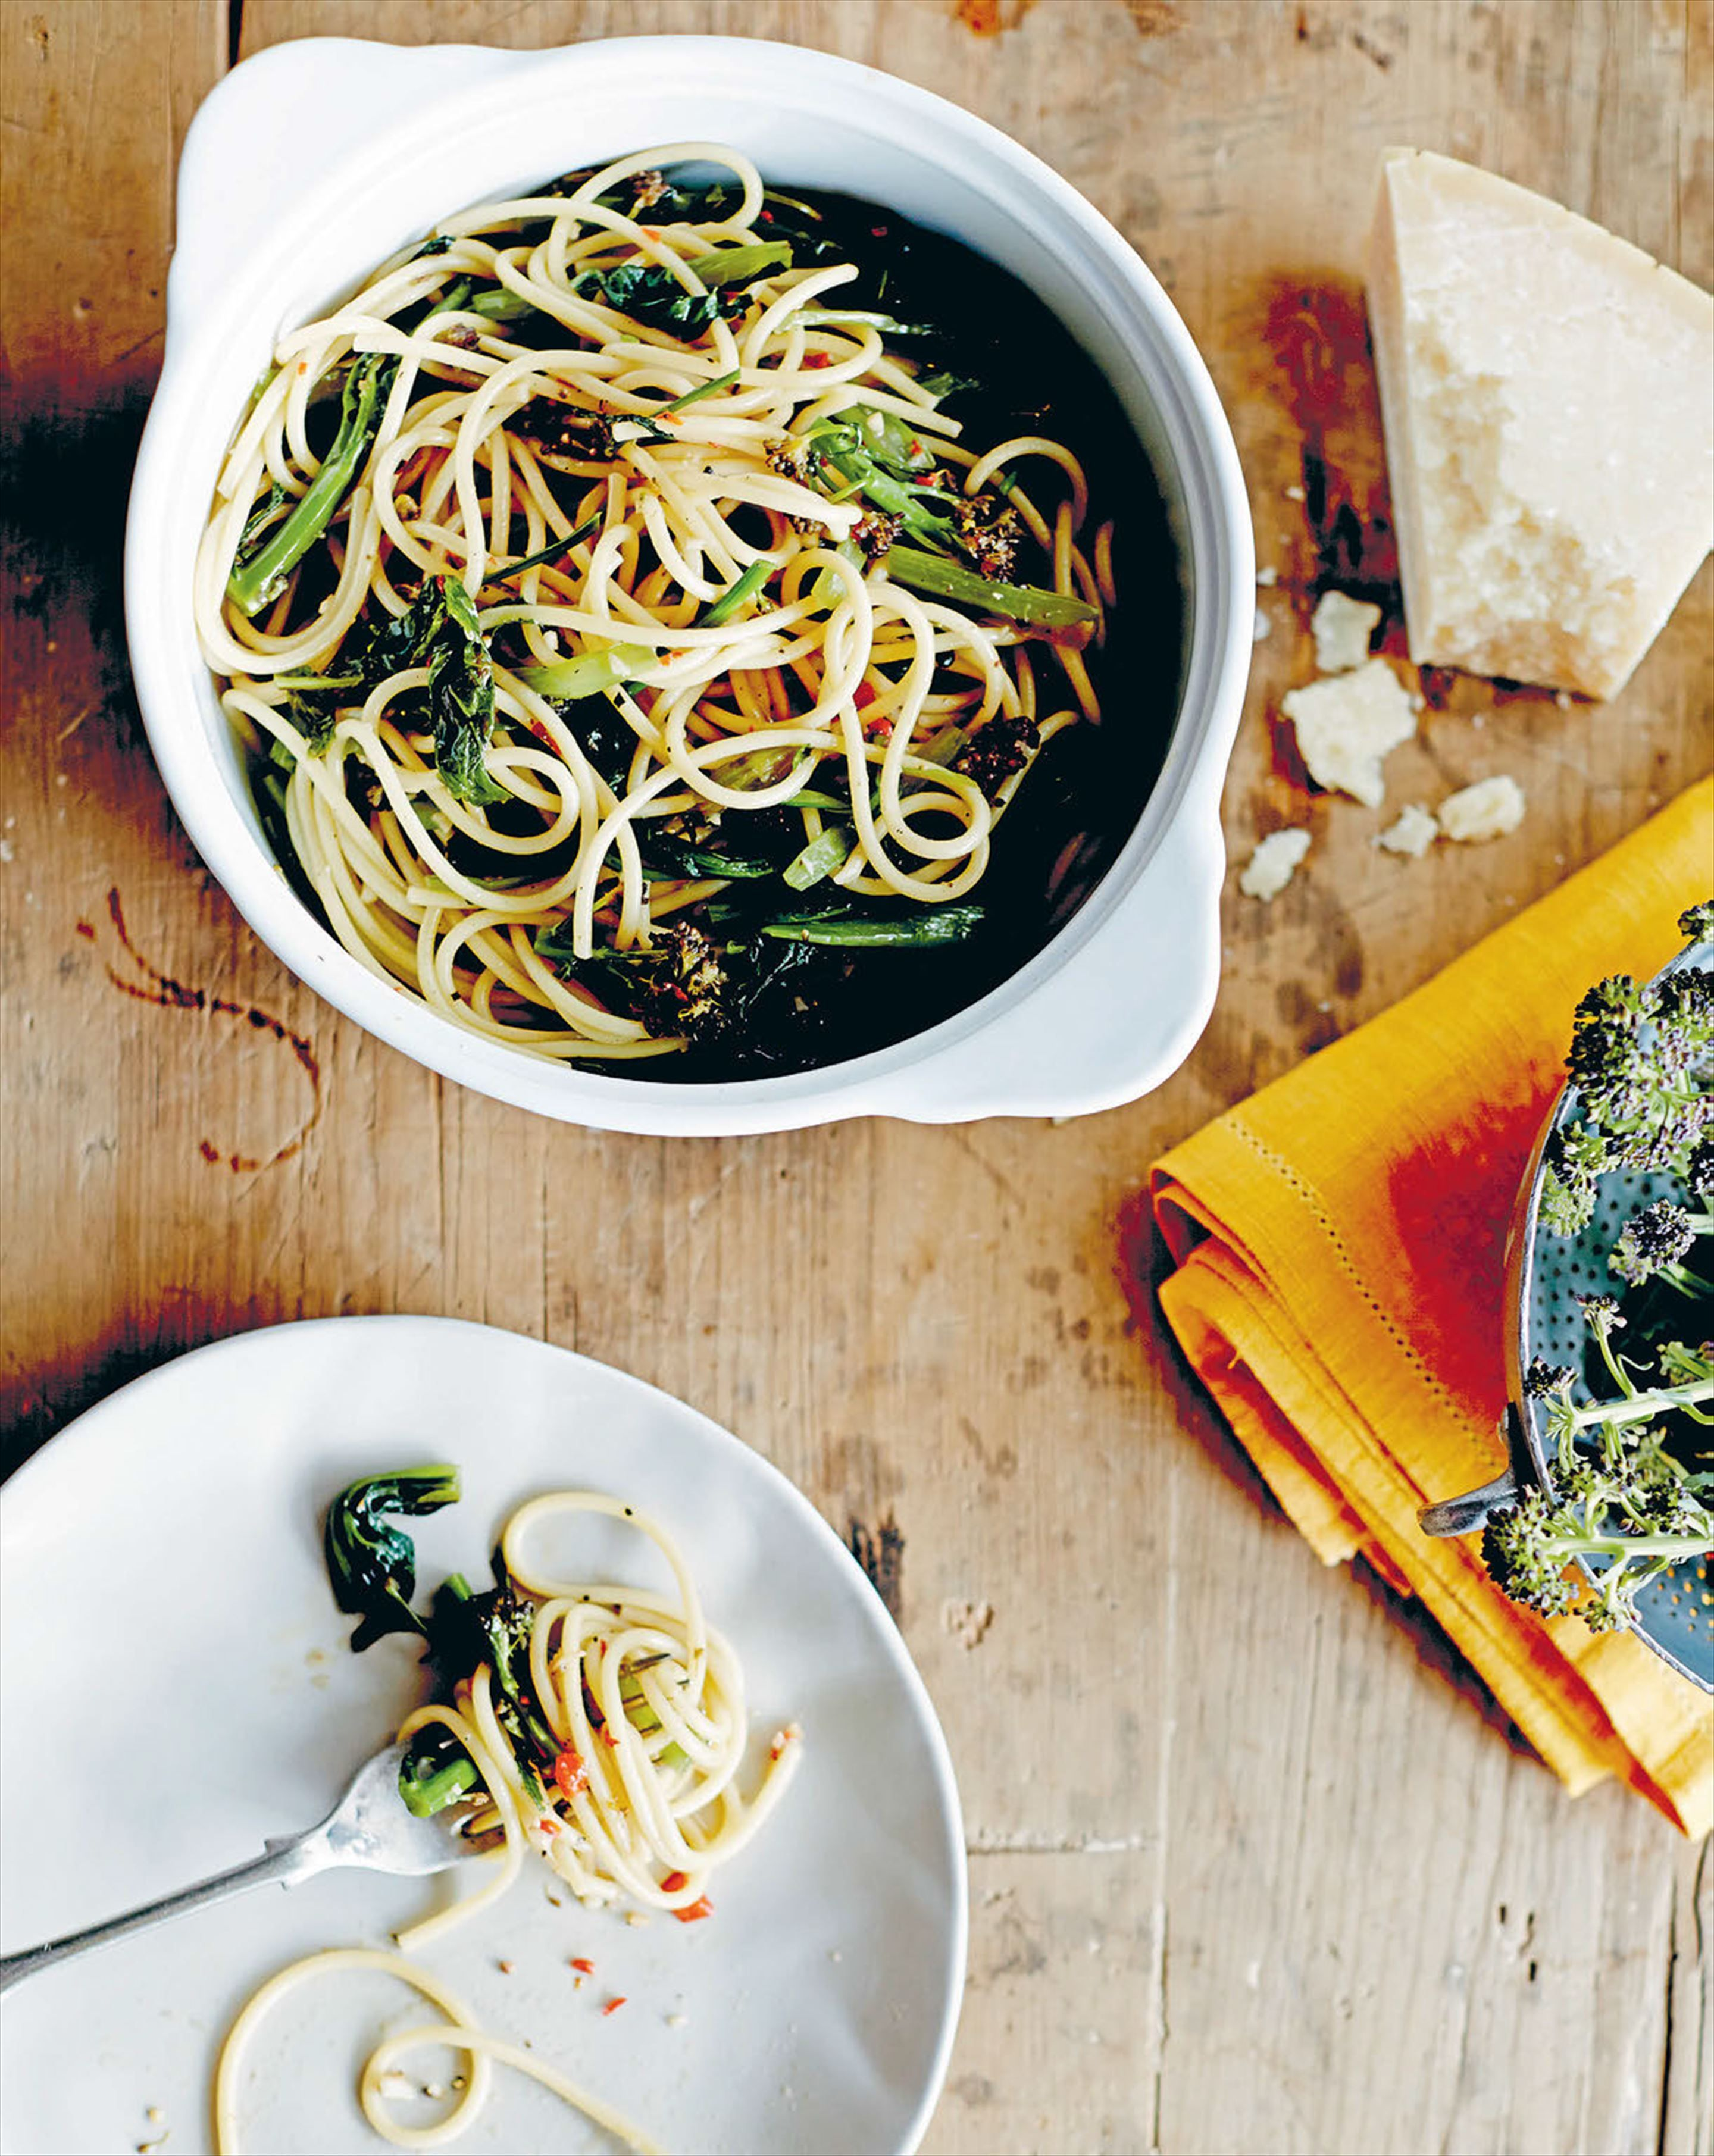 Spaghetti with rape recipe from My Italian Kitchen by Laura Cassai ...